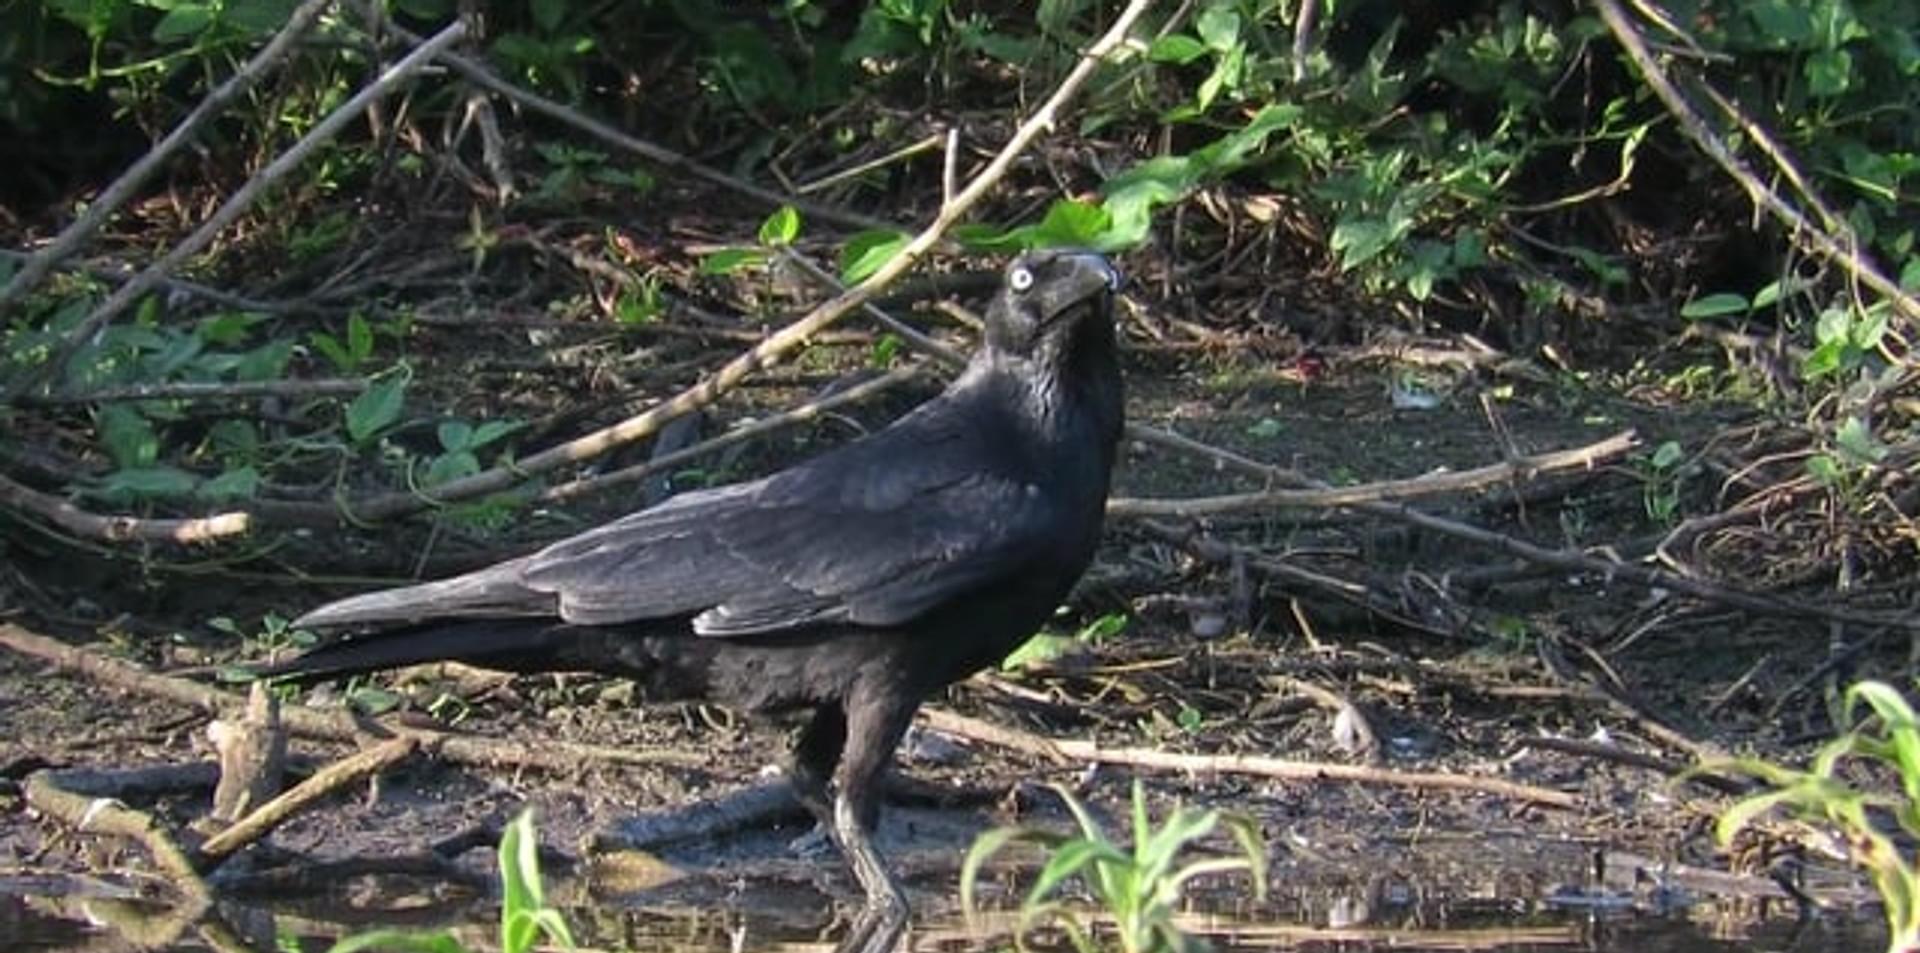 Adult Torresian Crow drinking water